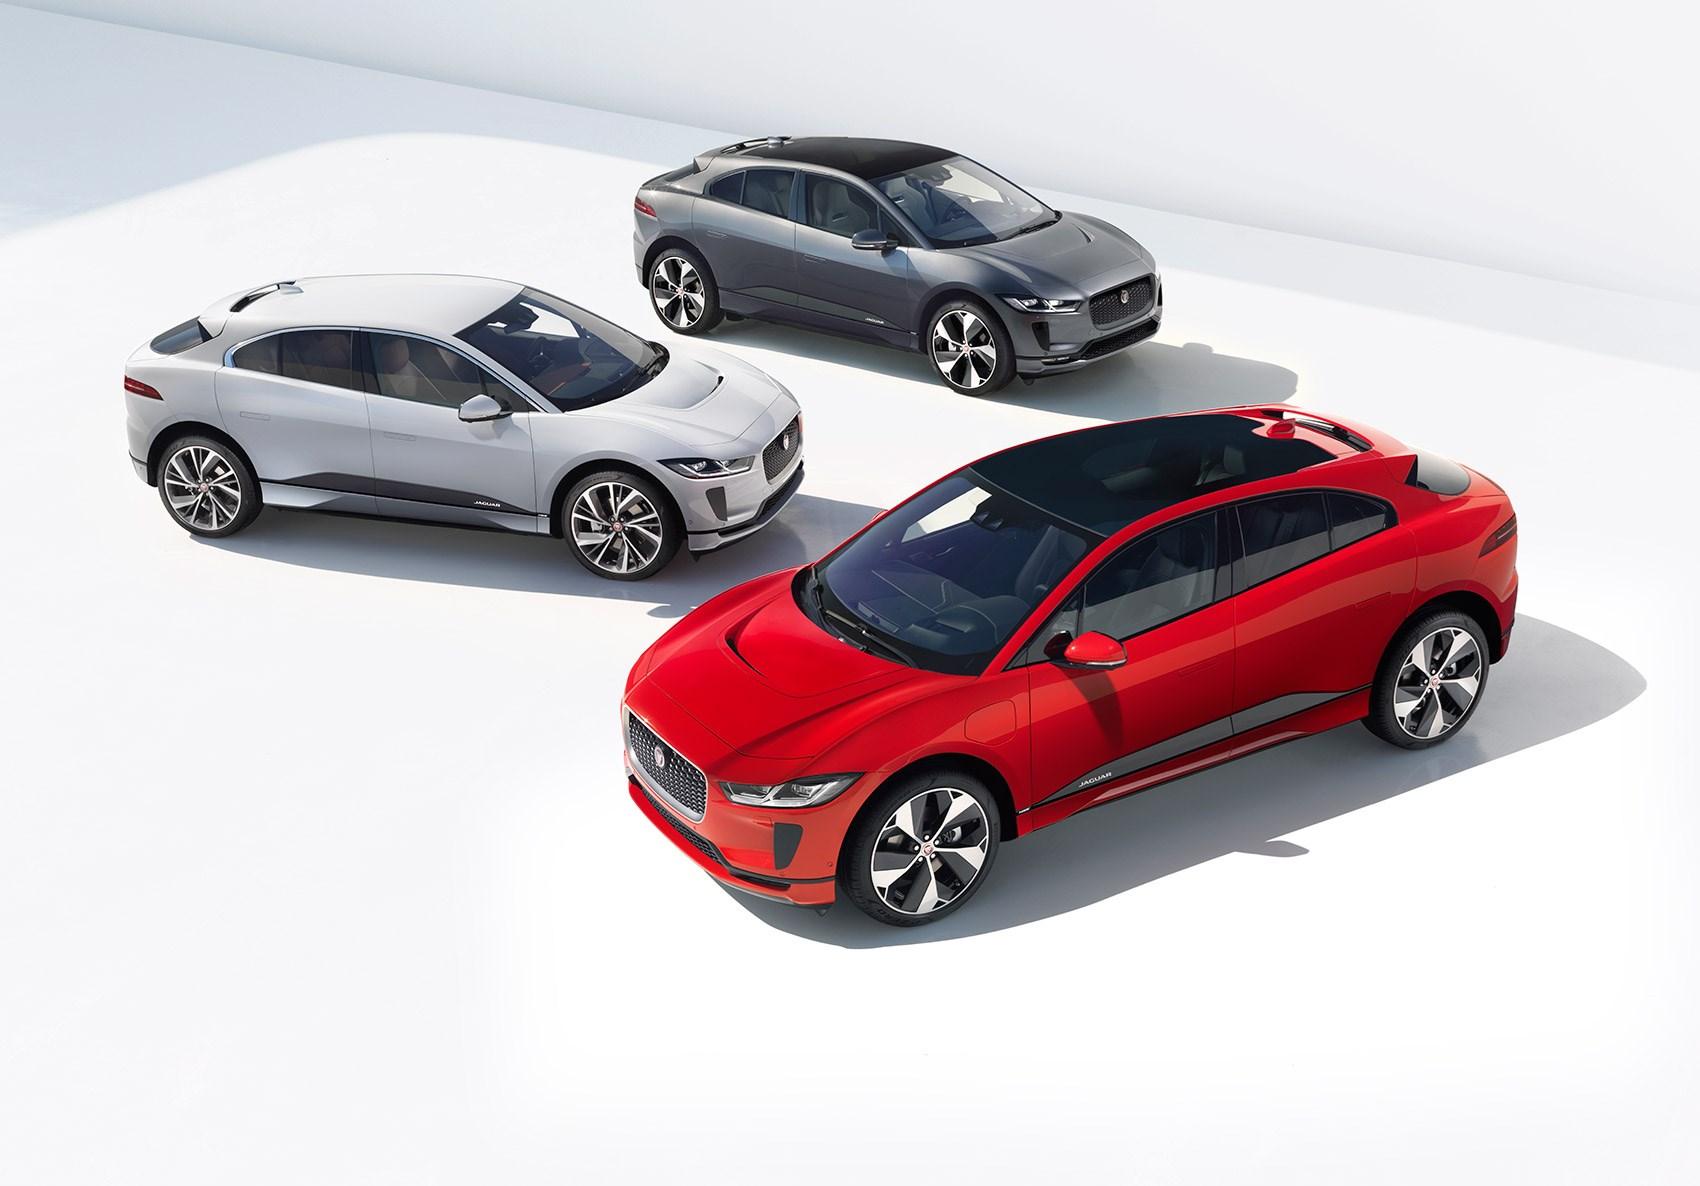 2018 Jaguar I-Pace: Design, Specs, Release >> Jaguar I Pace Electric Suv News Specs Prices Uk On Sale Dates